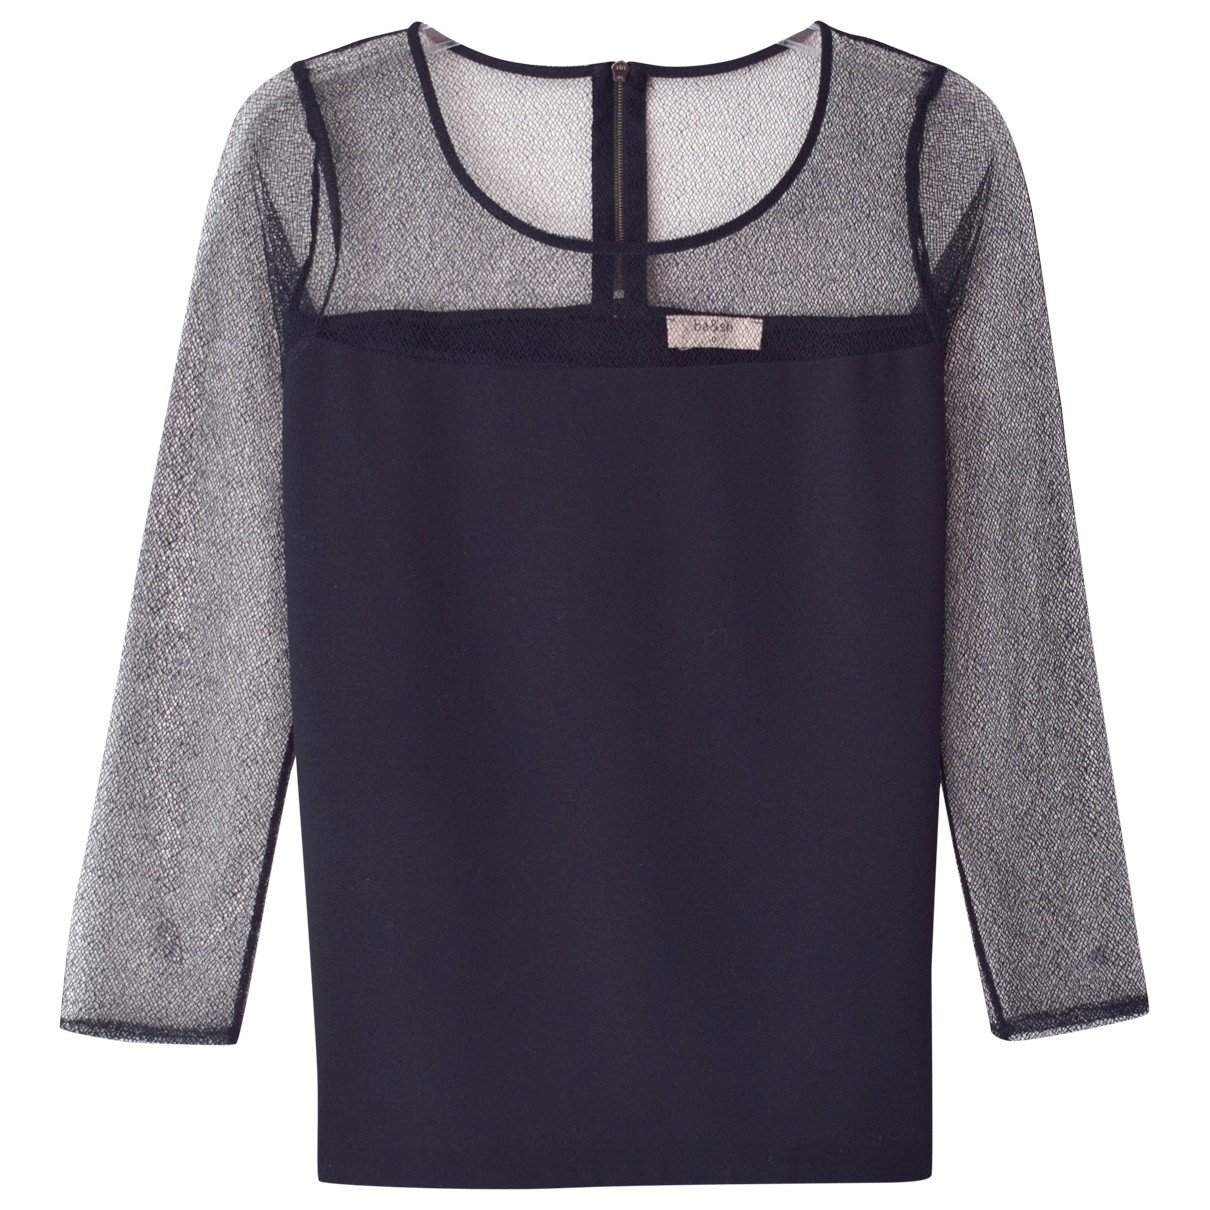 Ba&sh \N Top in  Schwarz Polyester